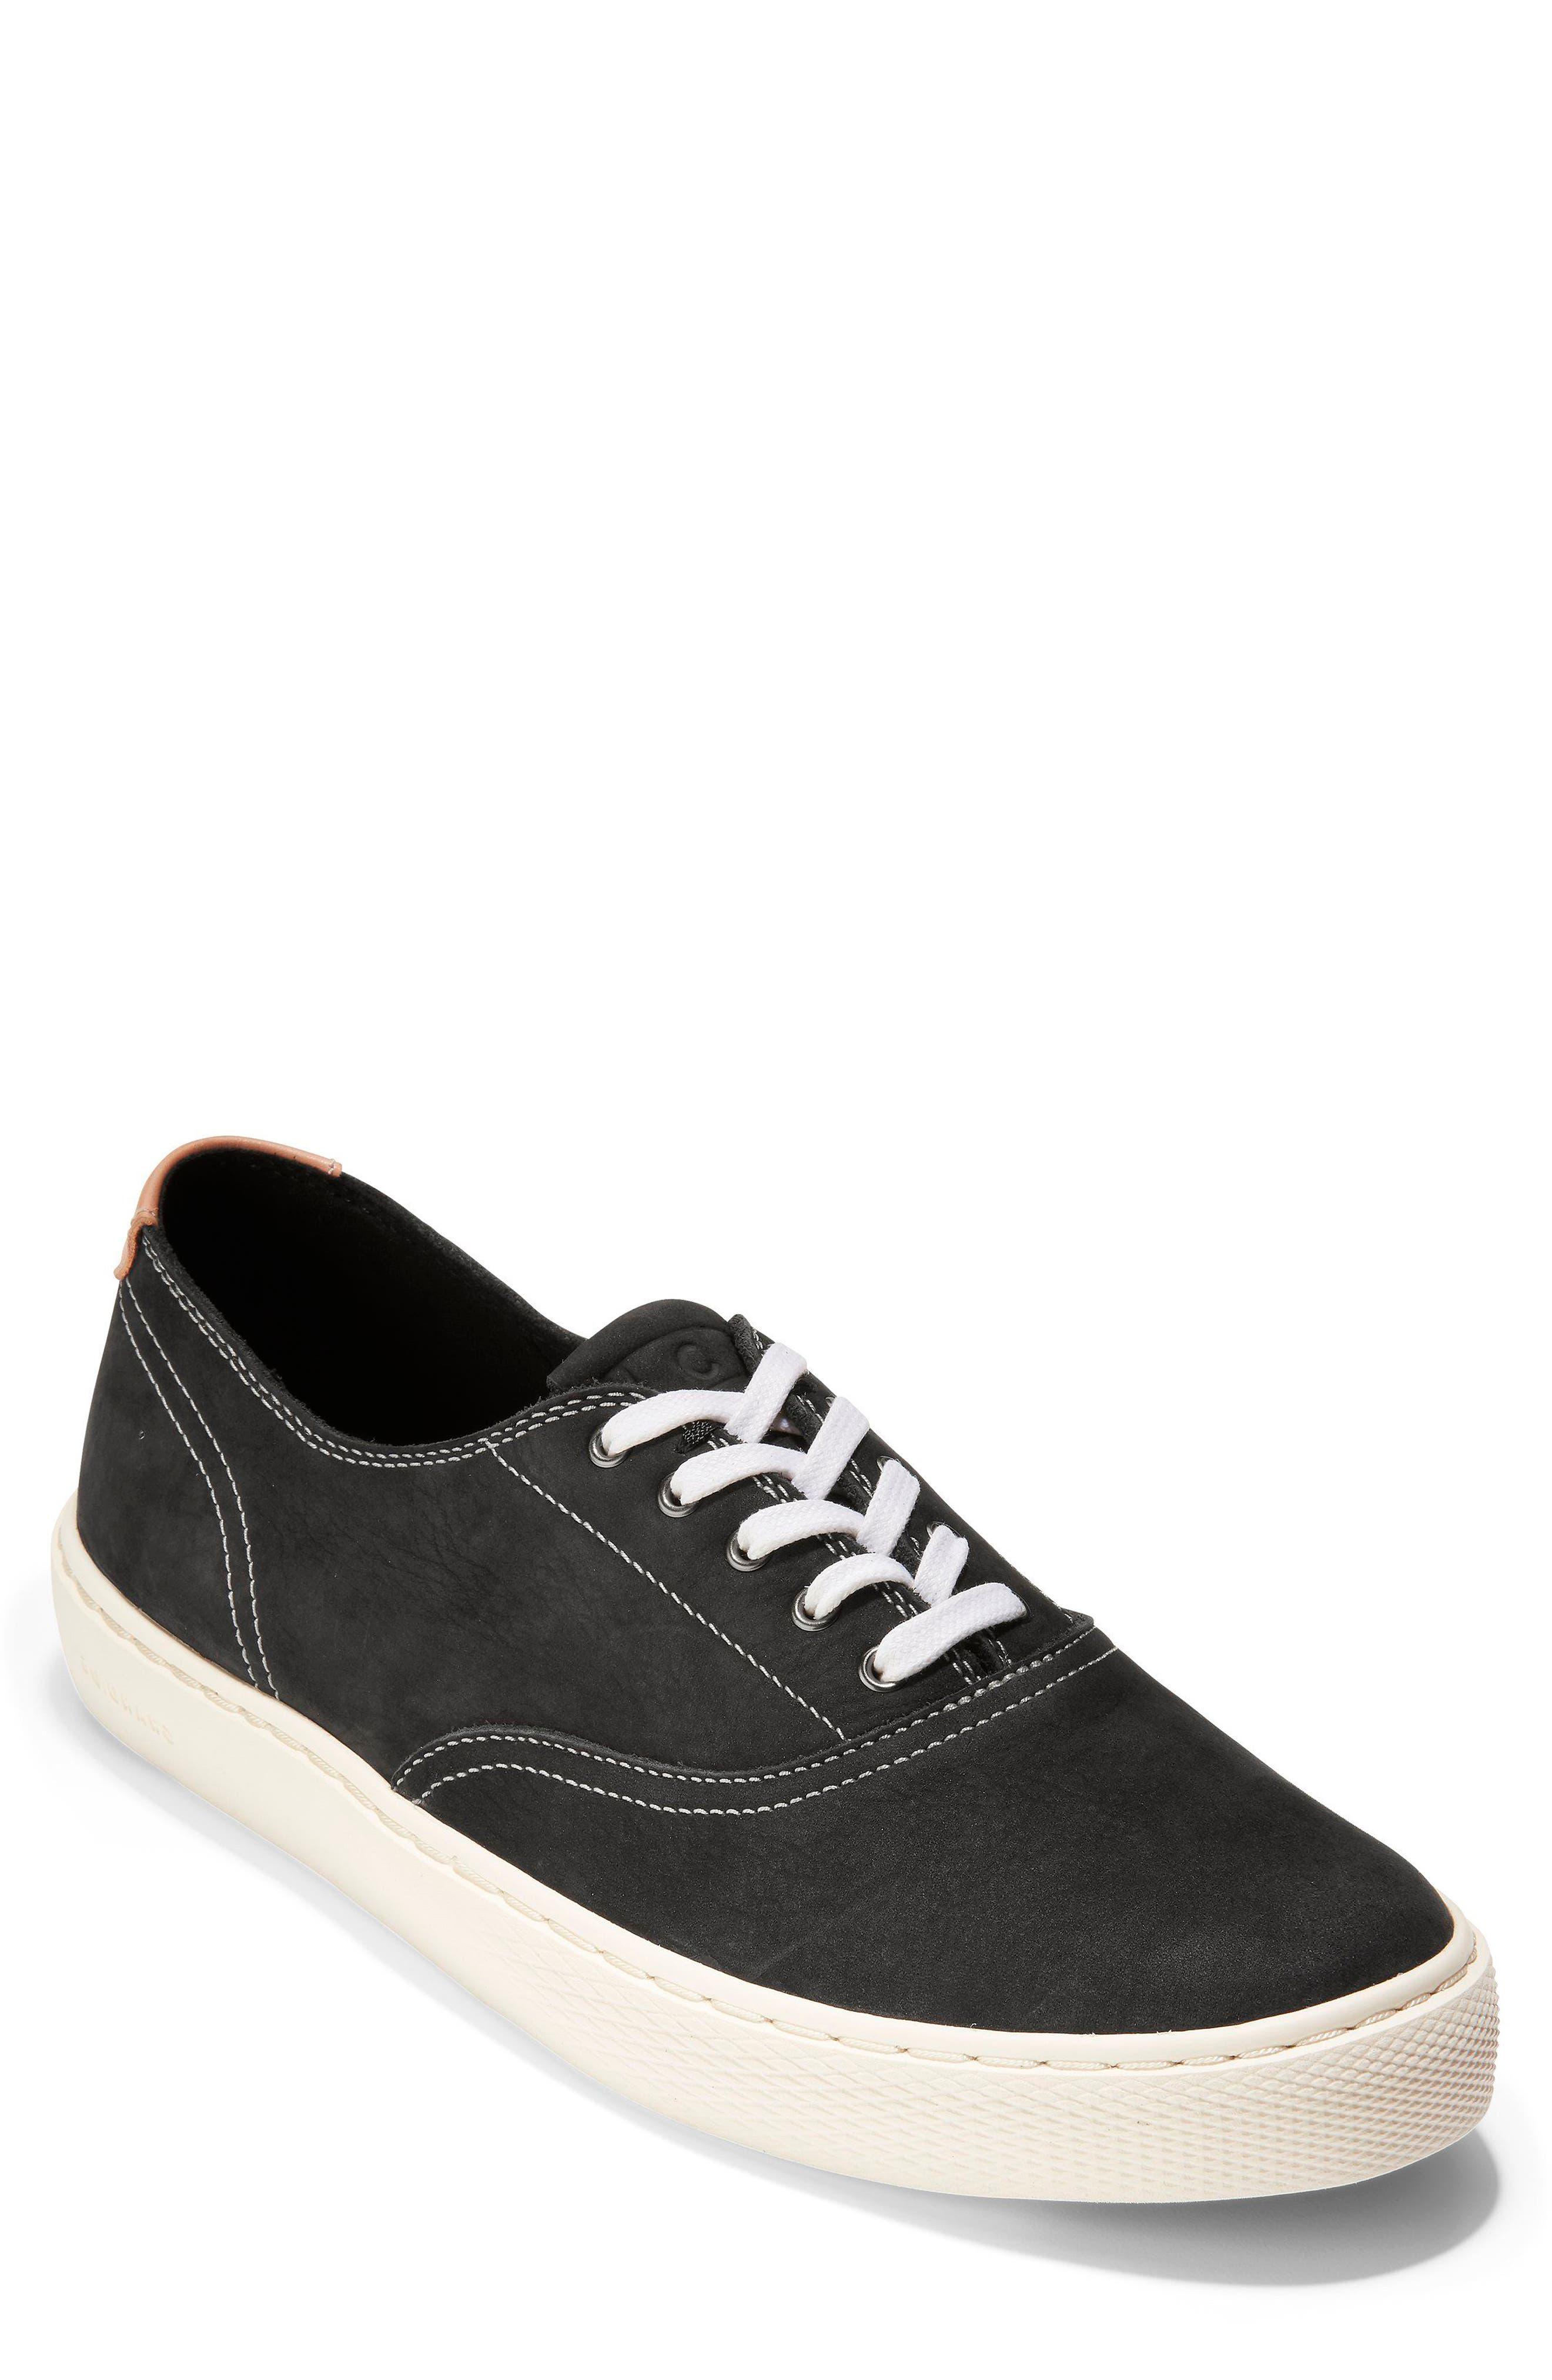 GrandPro Deck Low Top Sneaker,                         Main,                         color, 001